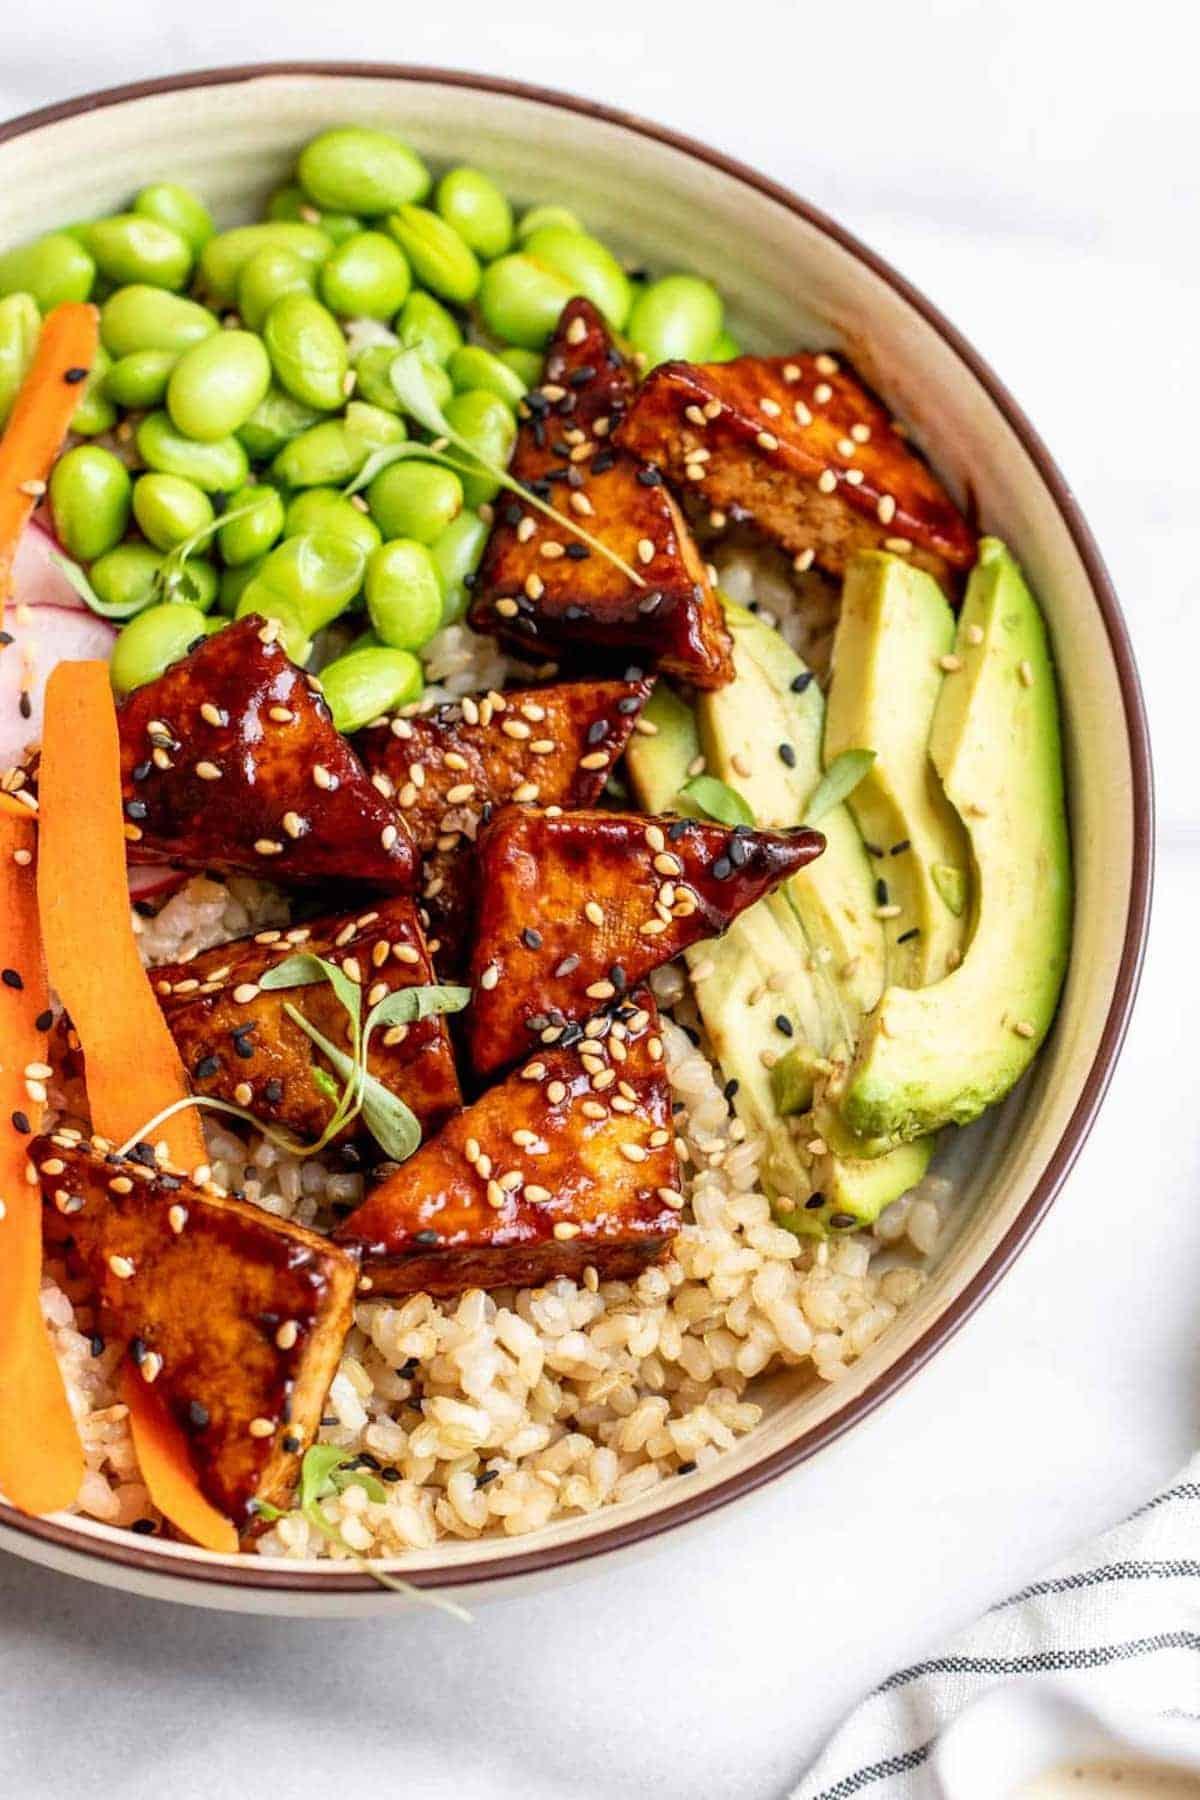 Vegan sushi bowl with tofu, avocado, and rice.